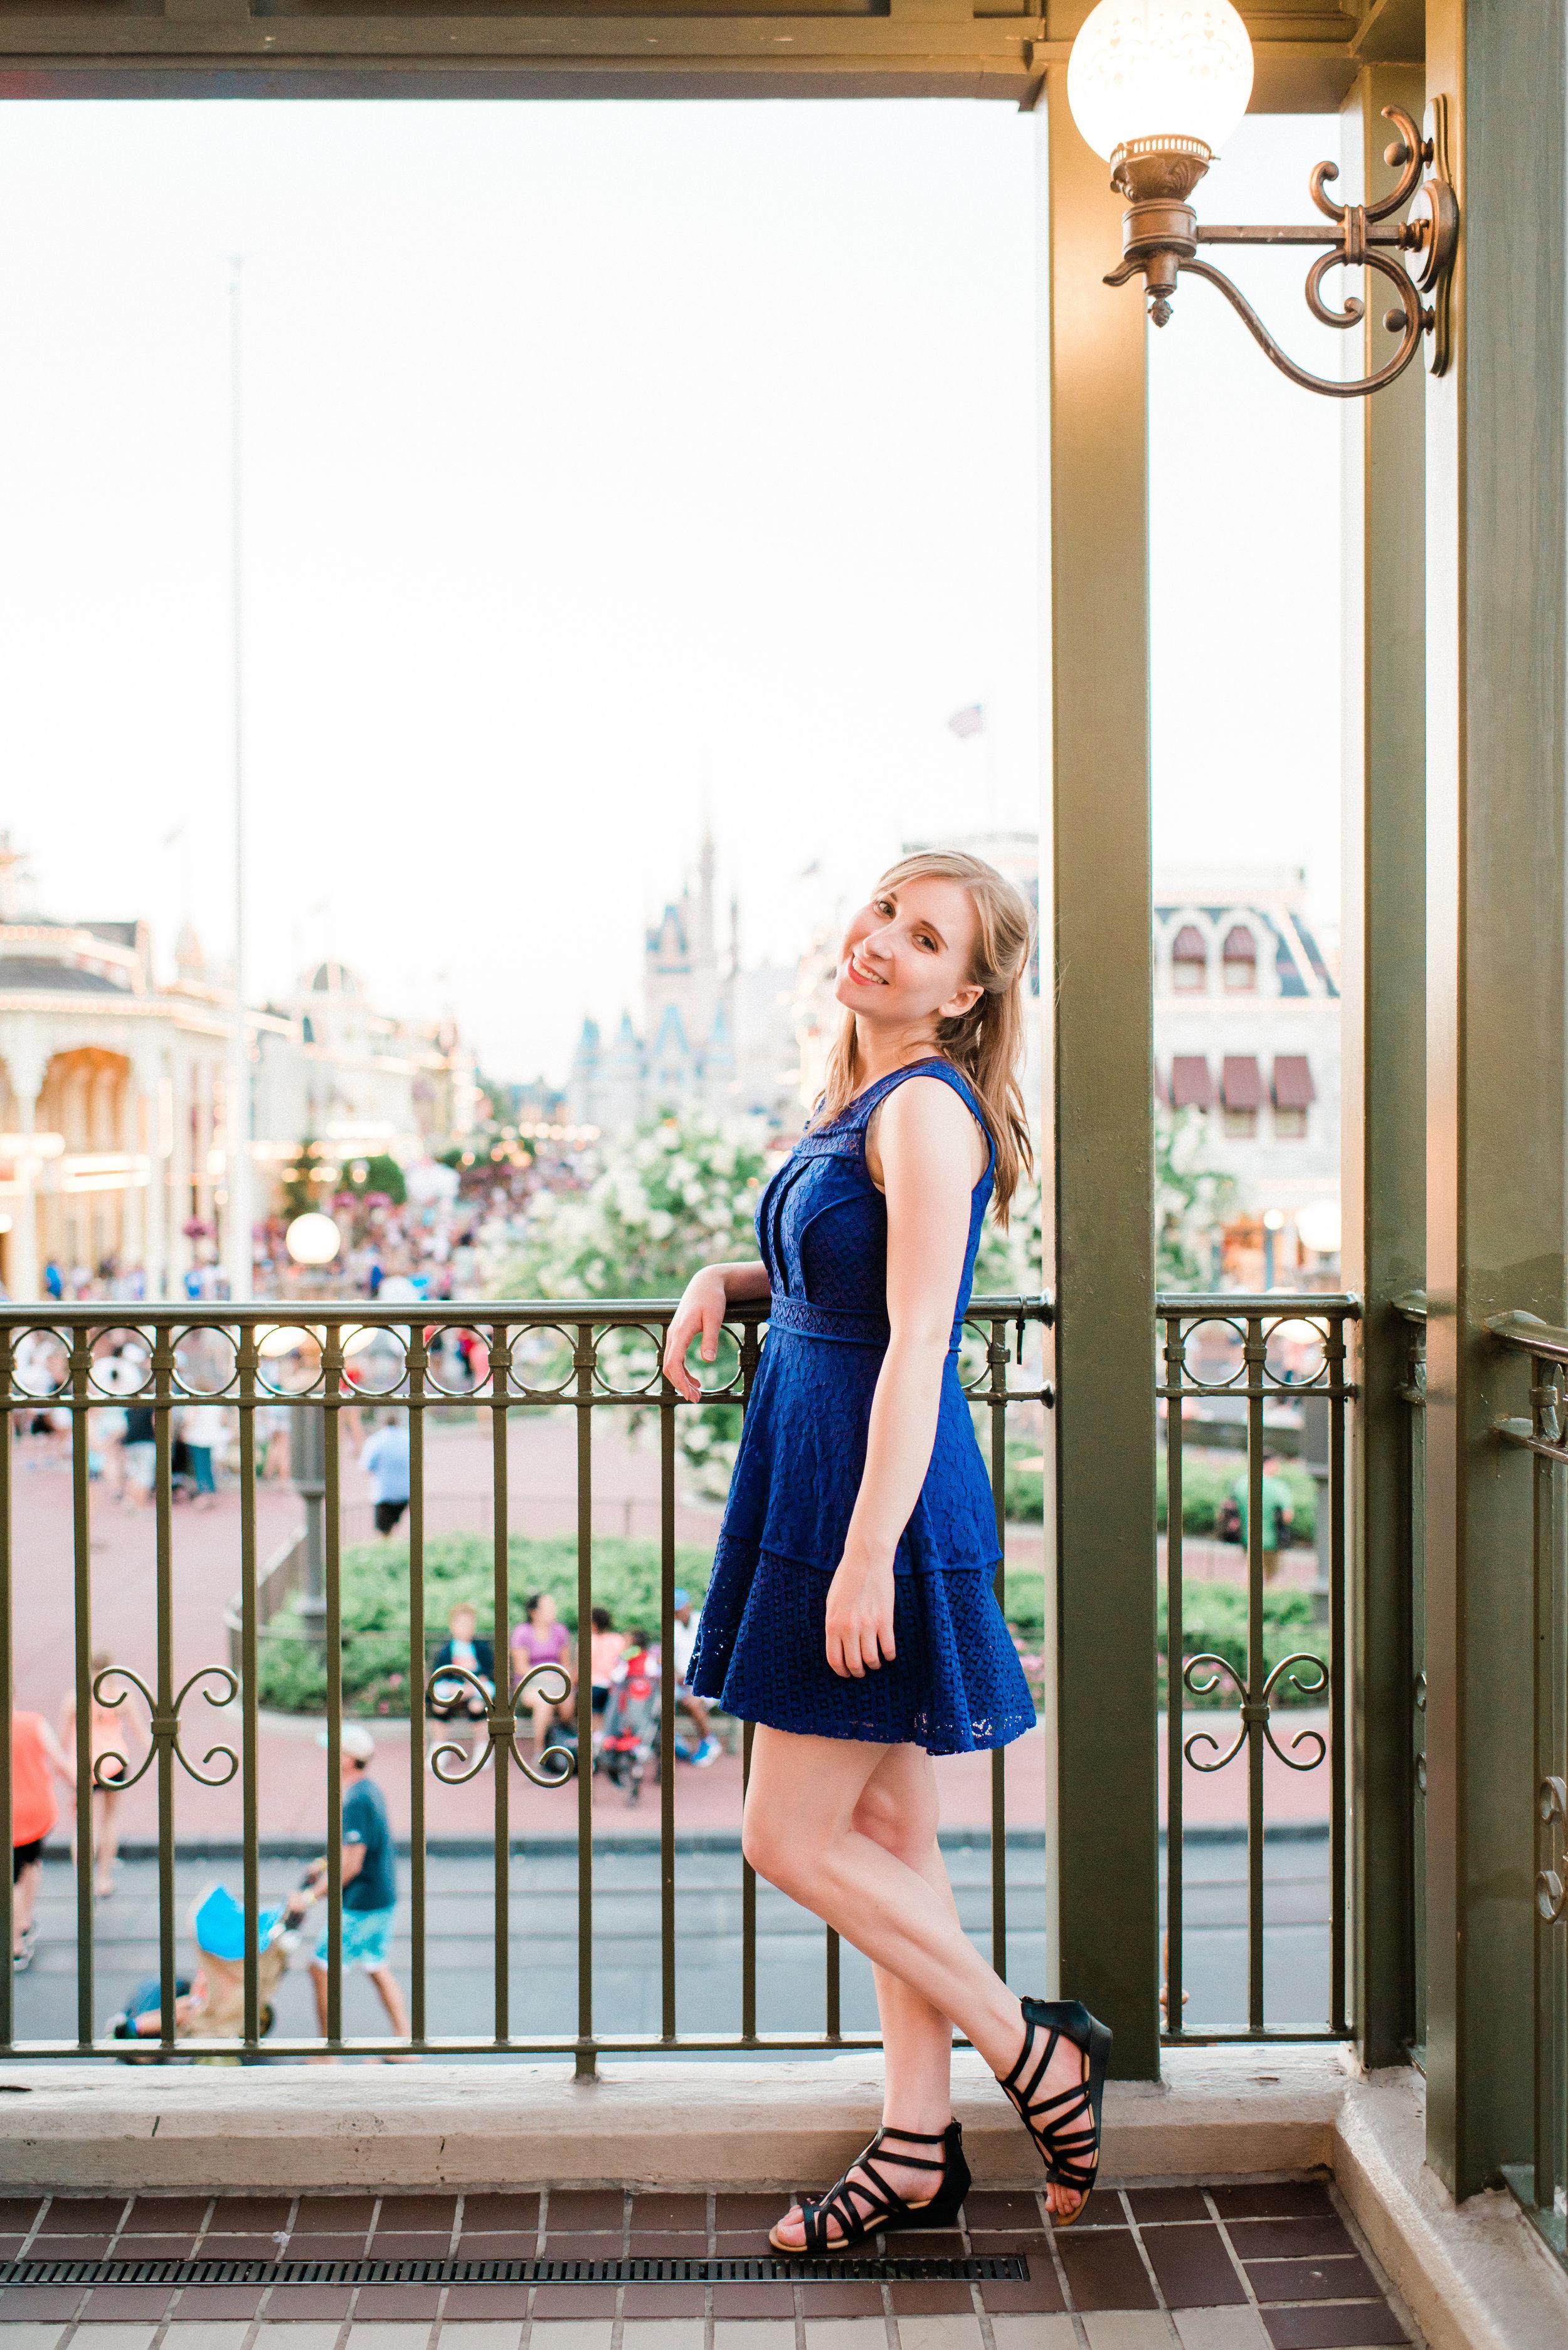 KateTaramykinStudios-Disney-World-Magic-Kingdom-Portraits-Jess-19.jpg